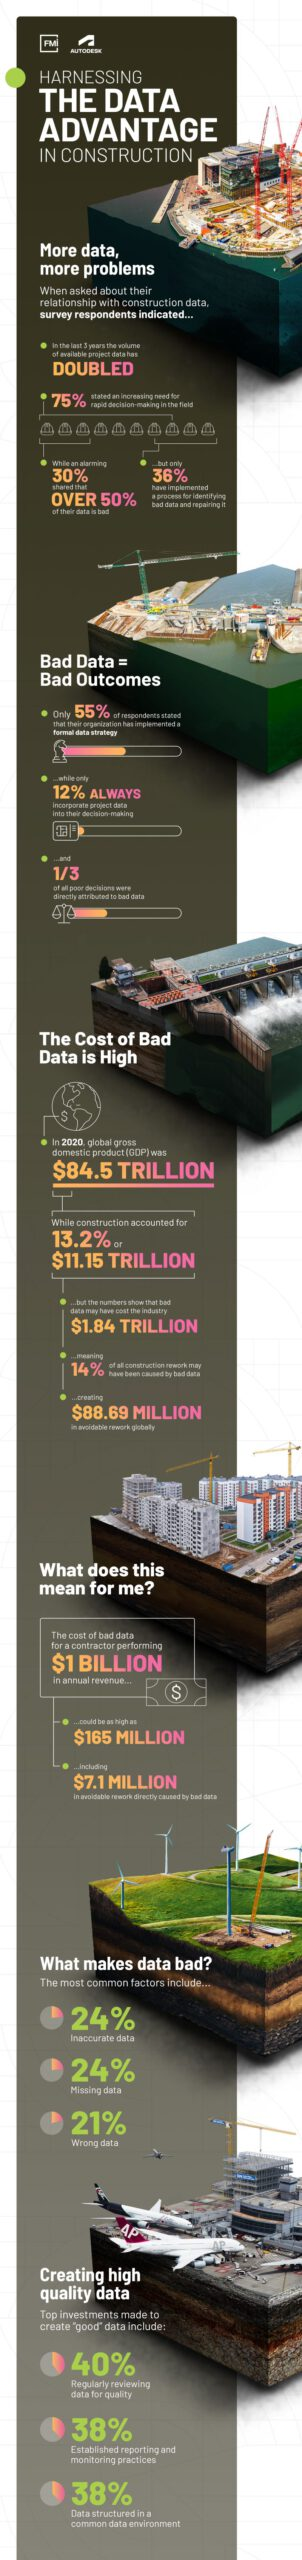 Autodesk & FMI Report, Harnessing the Data Advantage in Construction Infographic